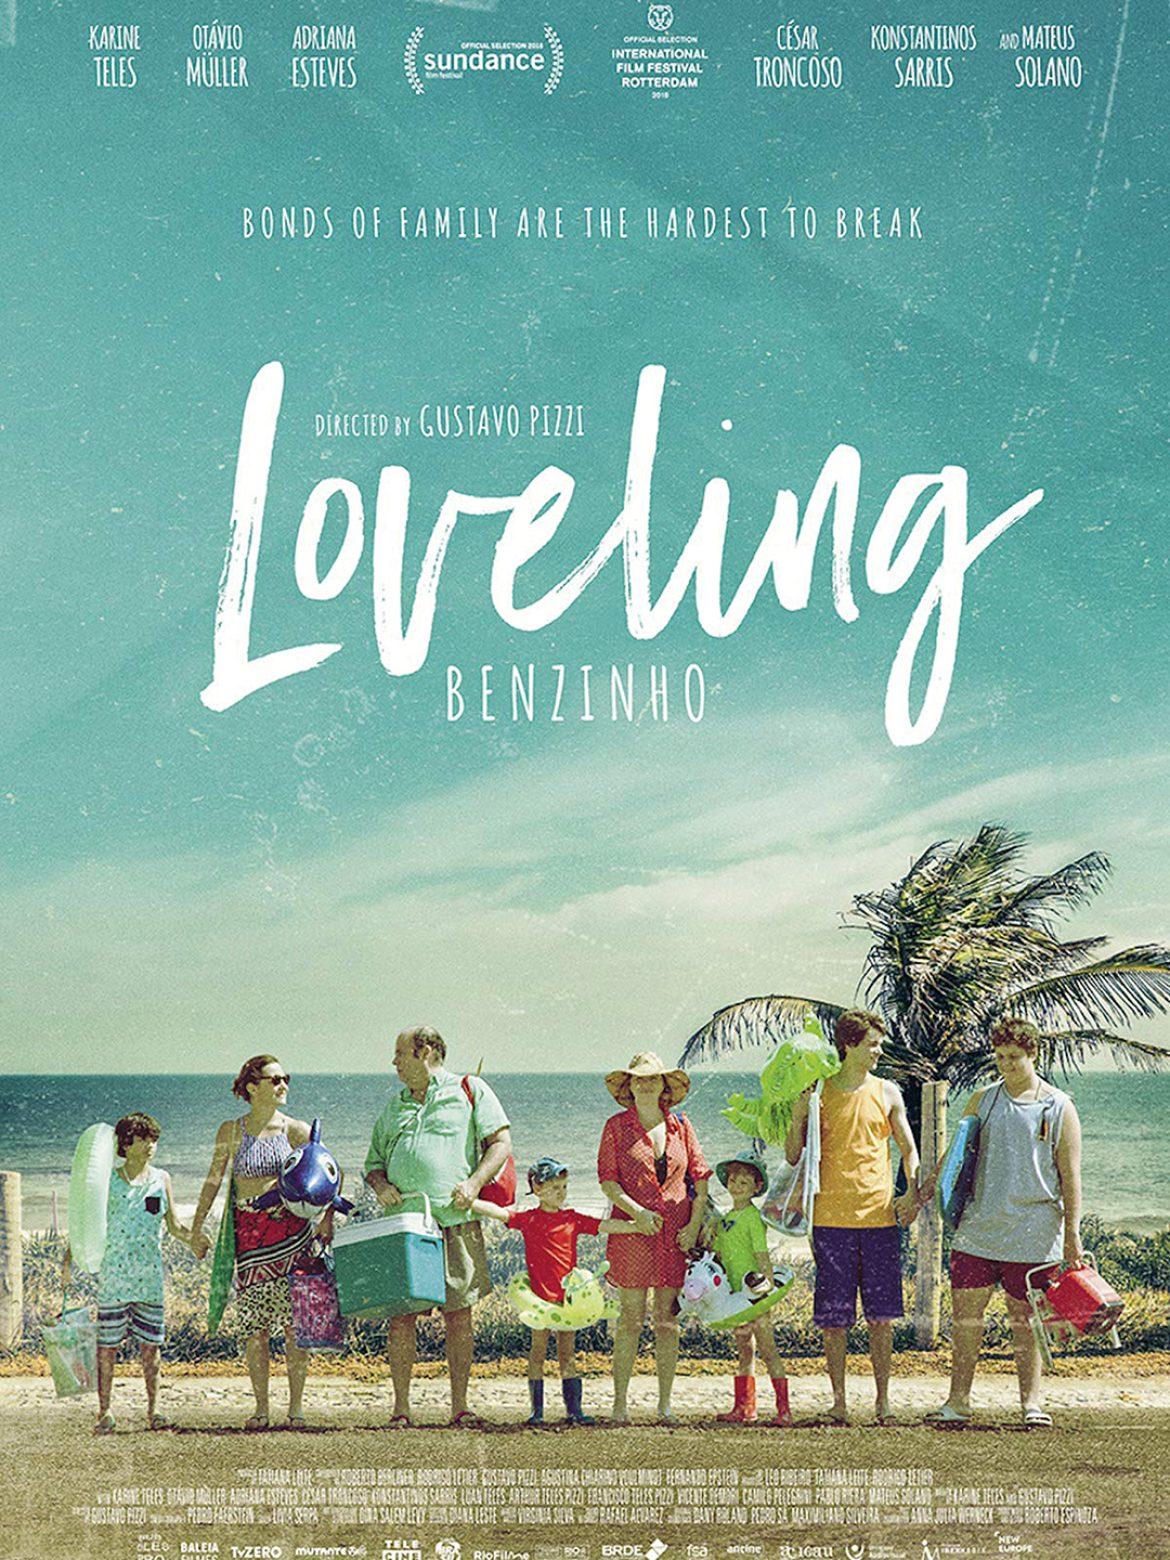 Film du Sud: Loveling – Benzinho (VOst)